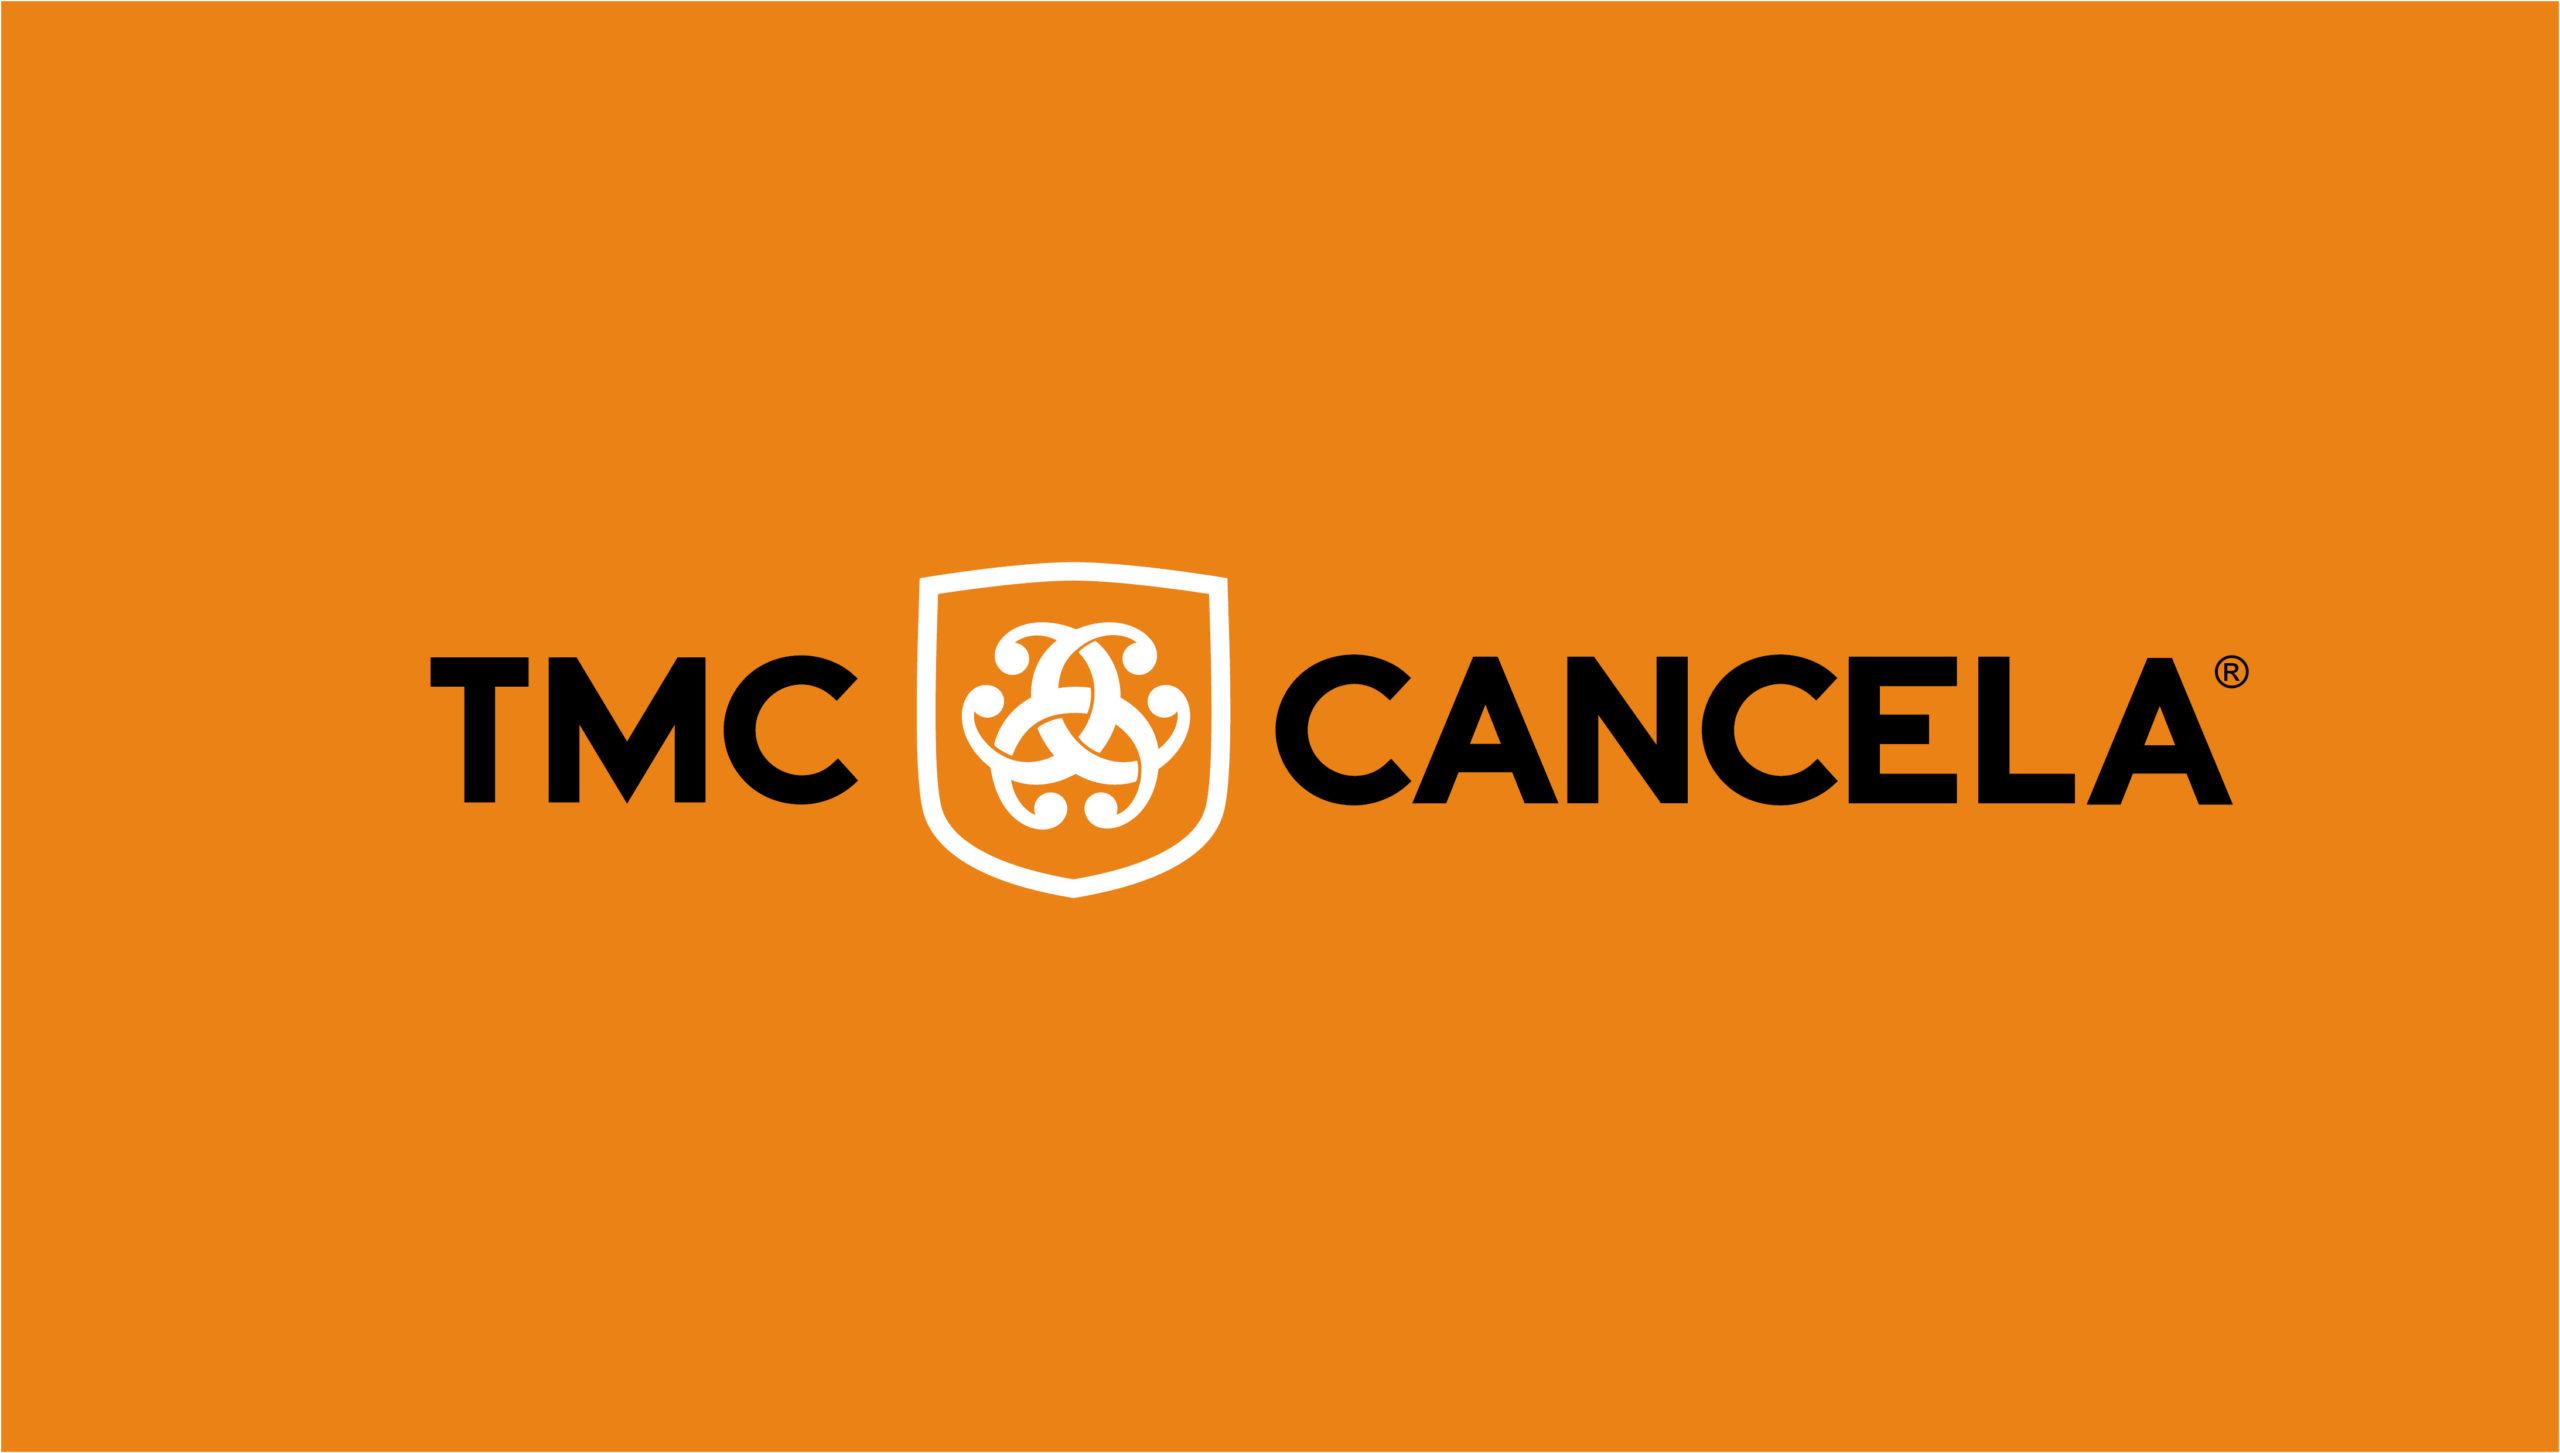 https://tmccancela.com/contenido/uploads/2016/07/TMC_PRESENTACION-scaled.jpg